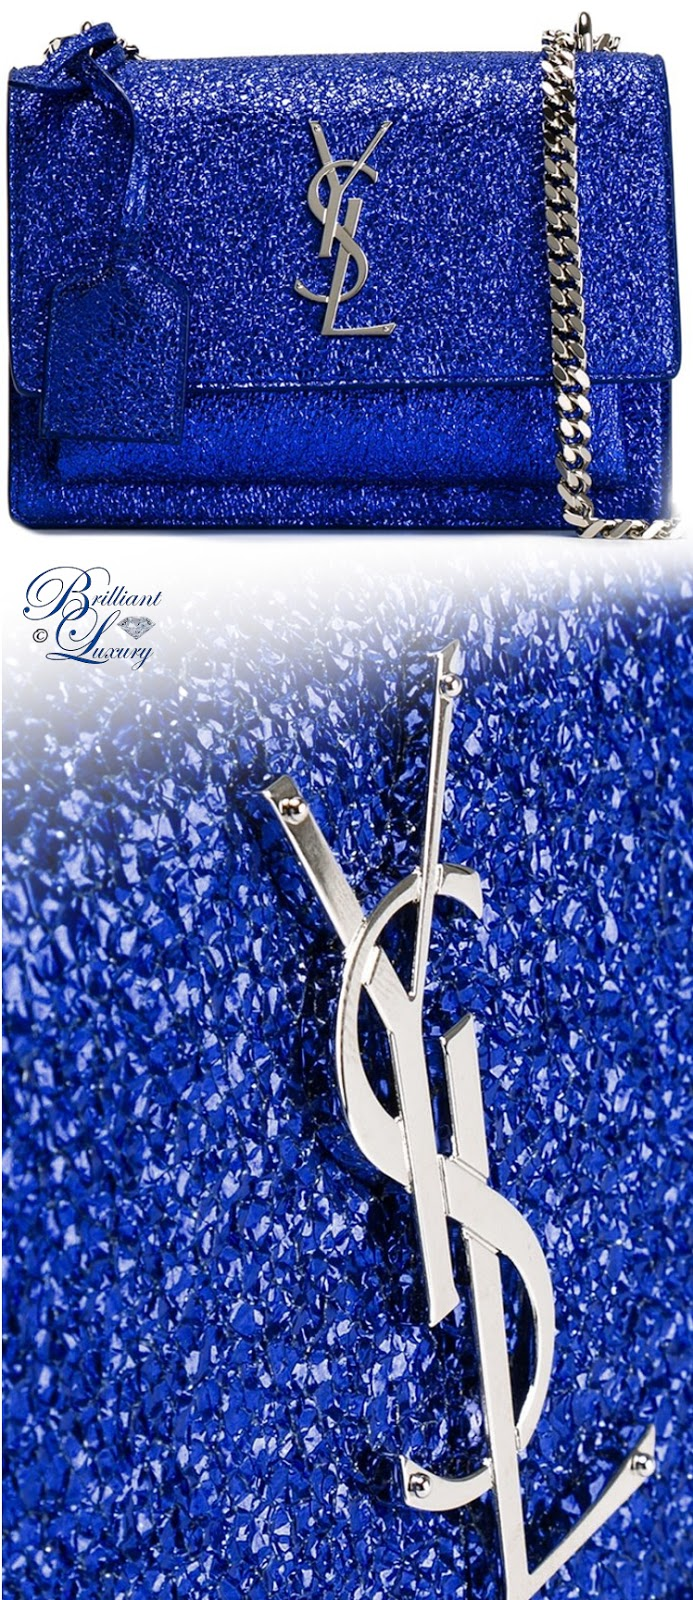 Brilliant Luxury ♦ Saint Laurent Small Sunset Monogram Satchel